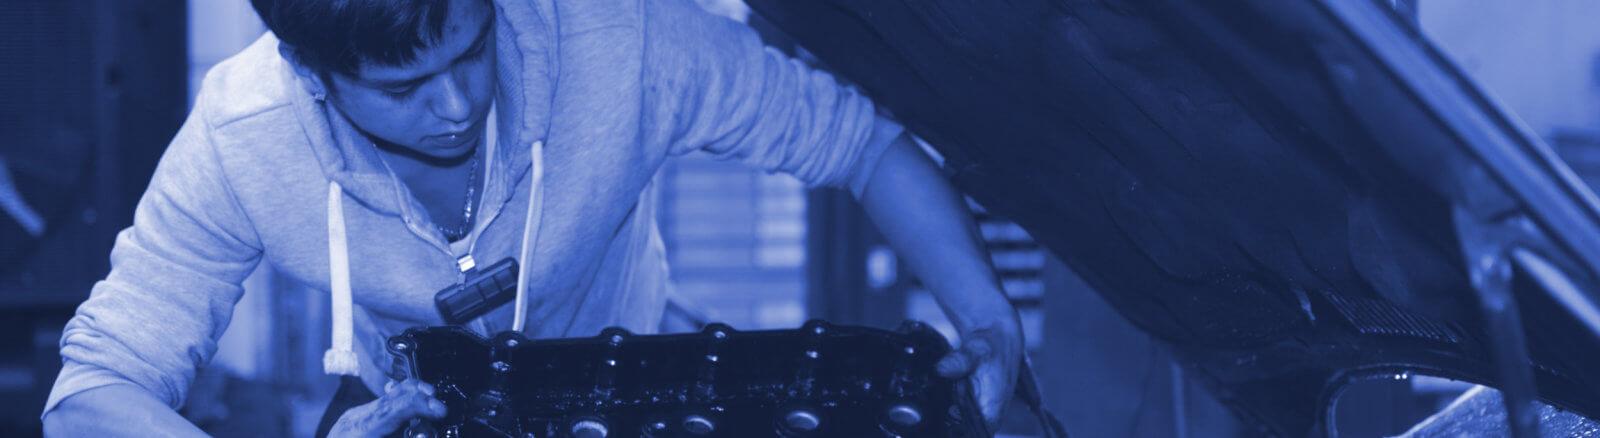 Audi Repairs and Service in Denver